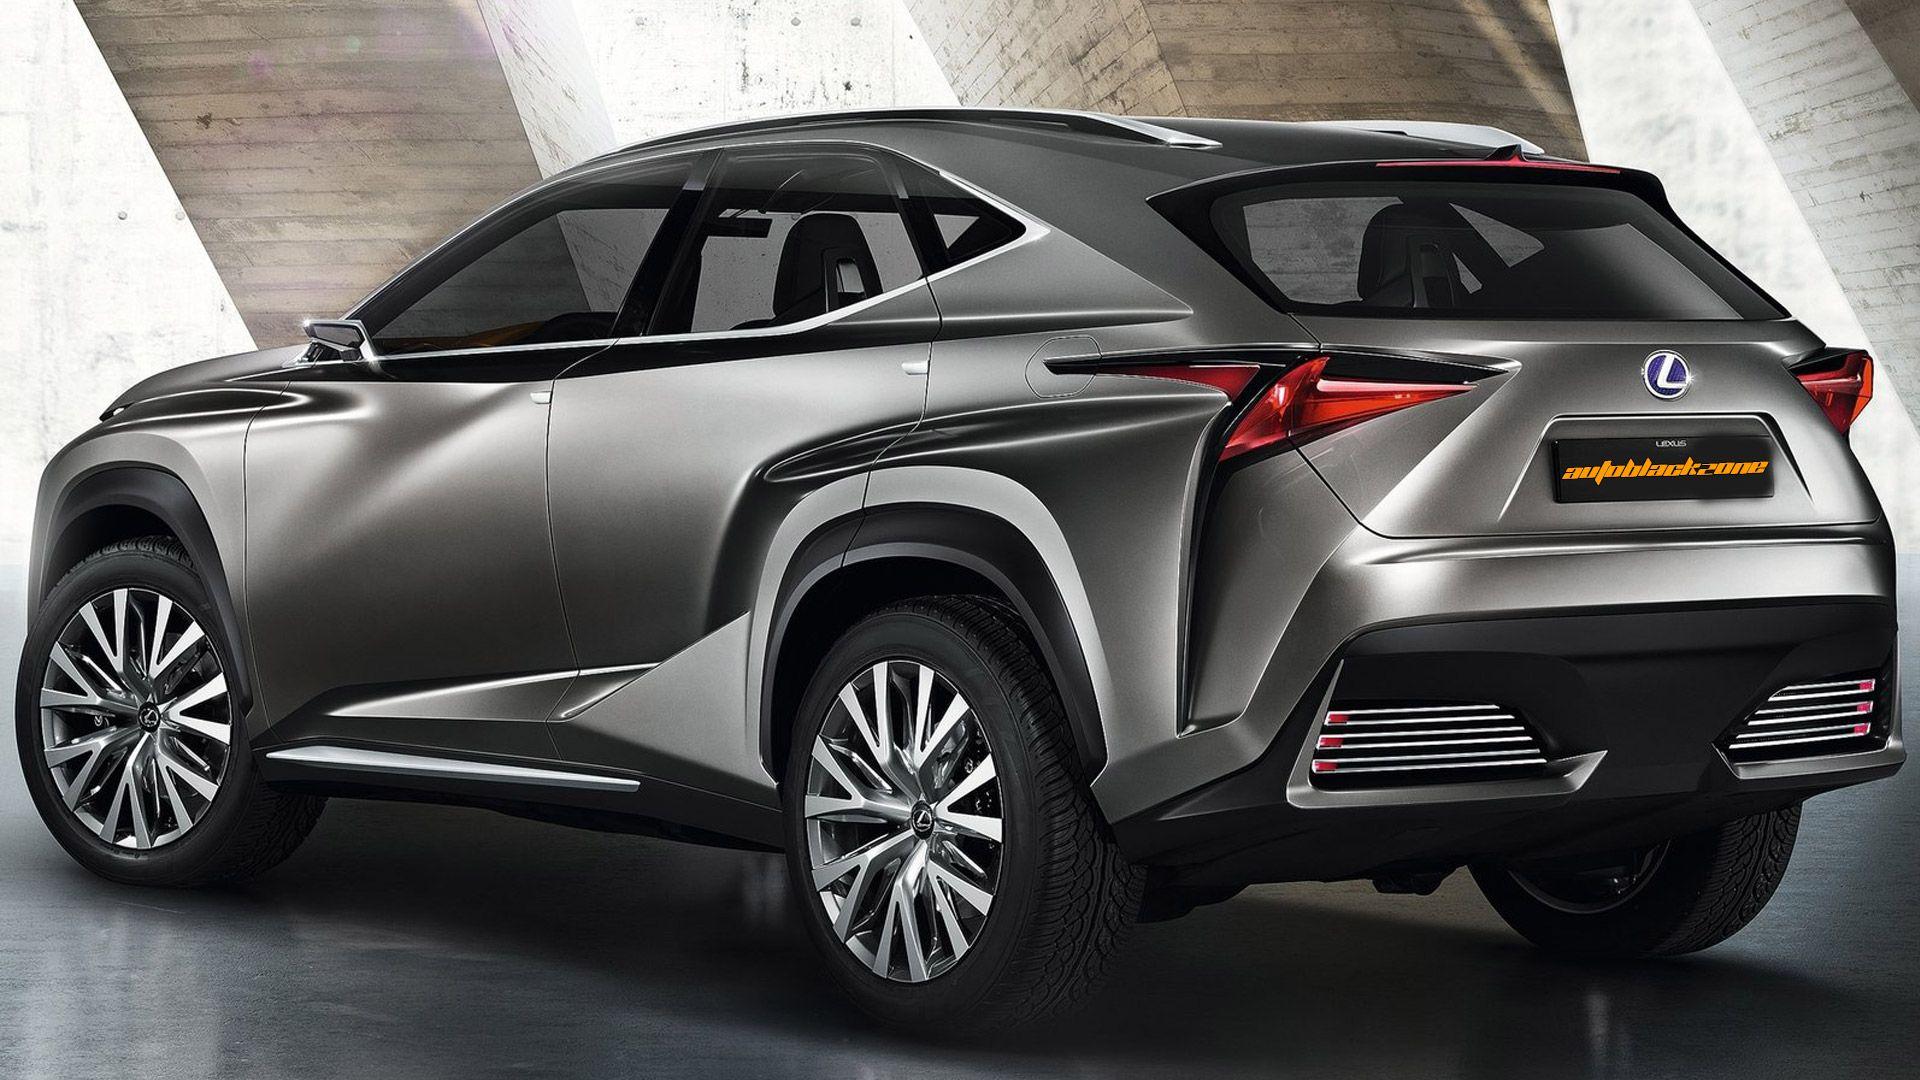 2013 lf nx concept Exterior 2013 Lexus LF NX Concept Model   2013 ...